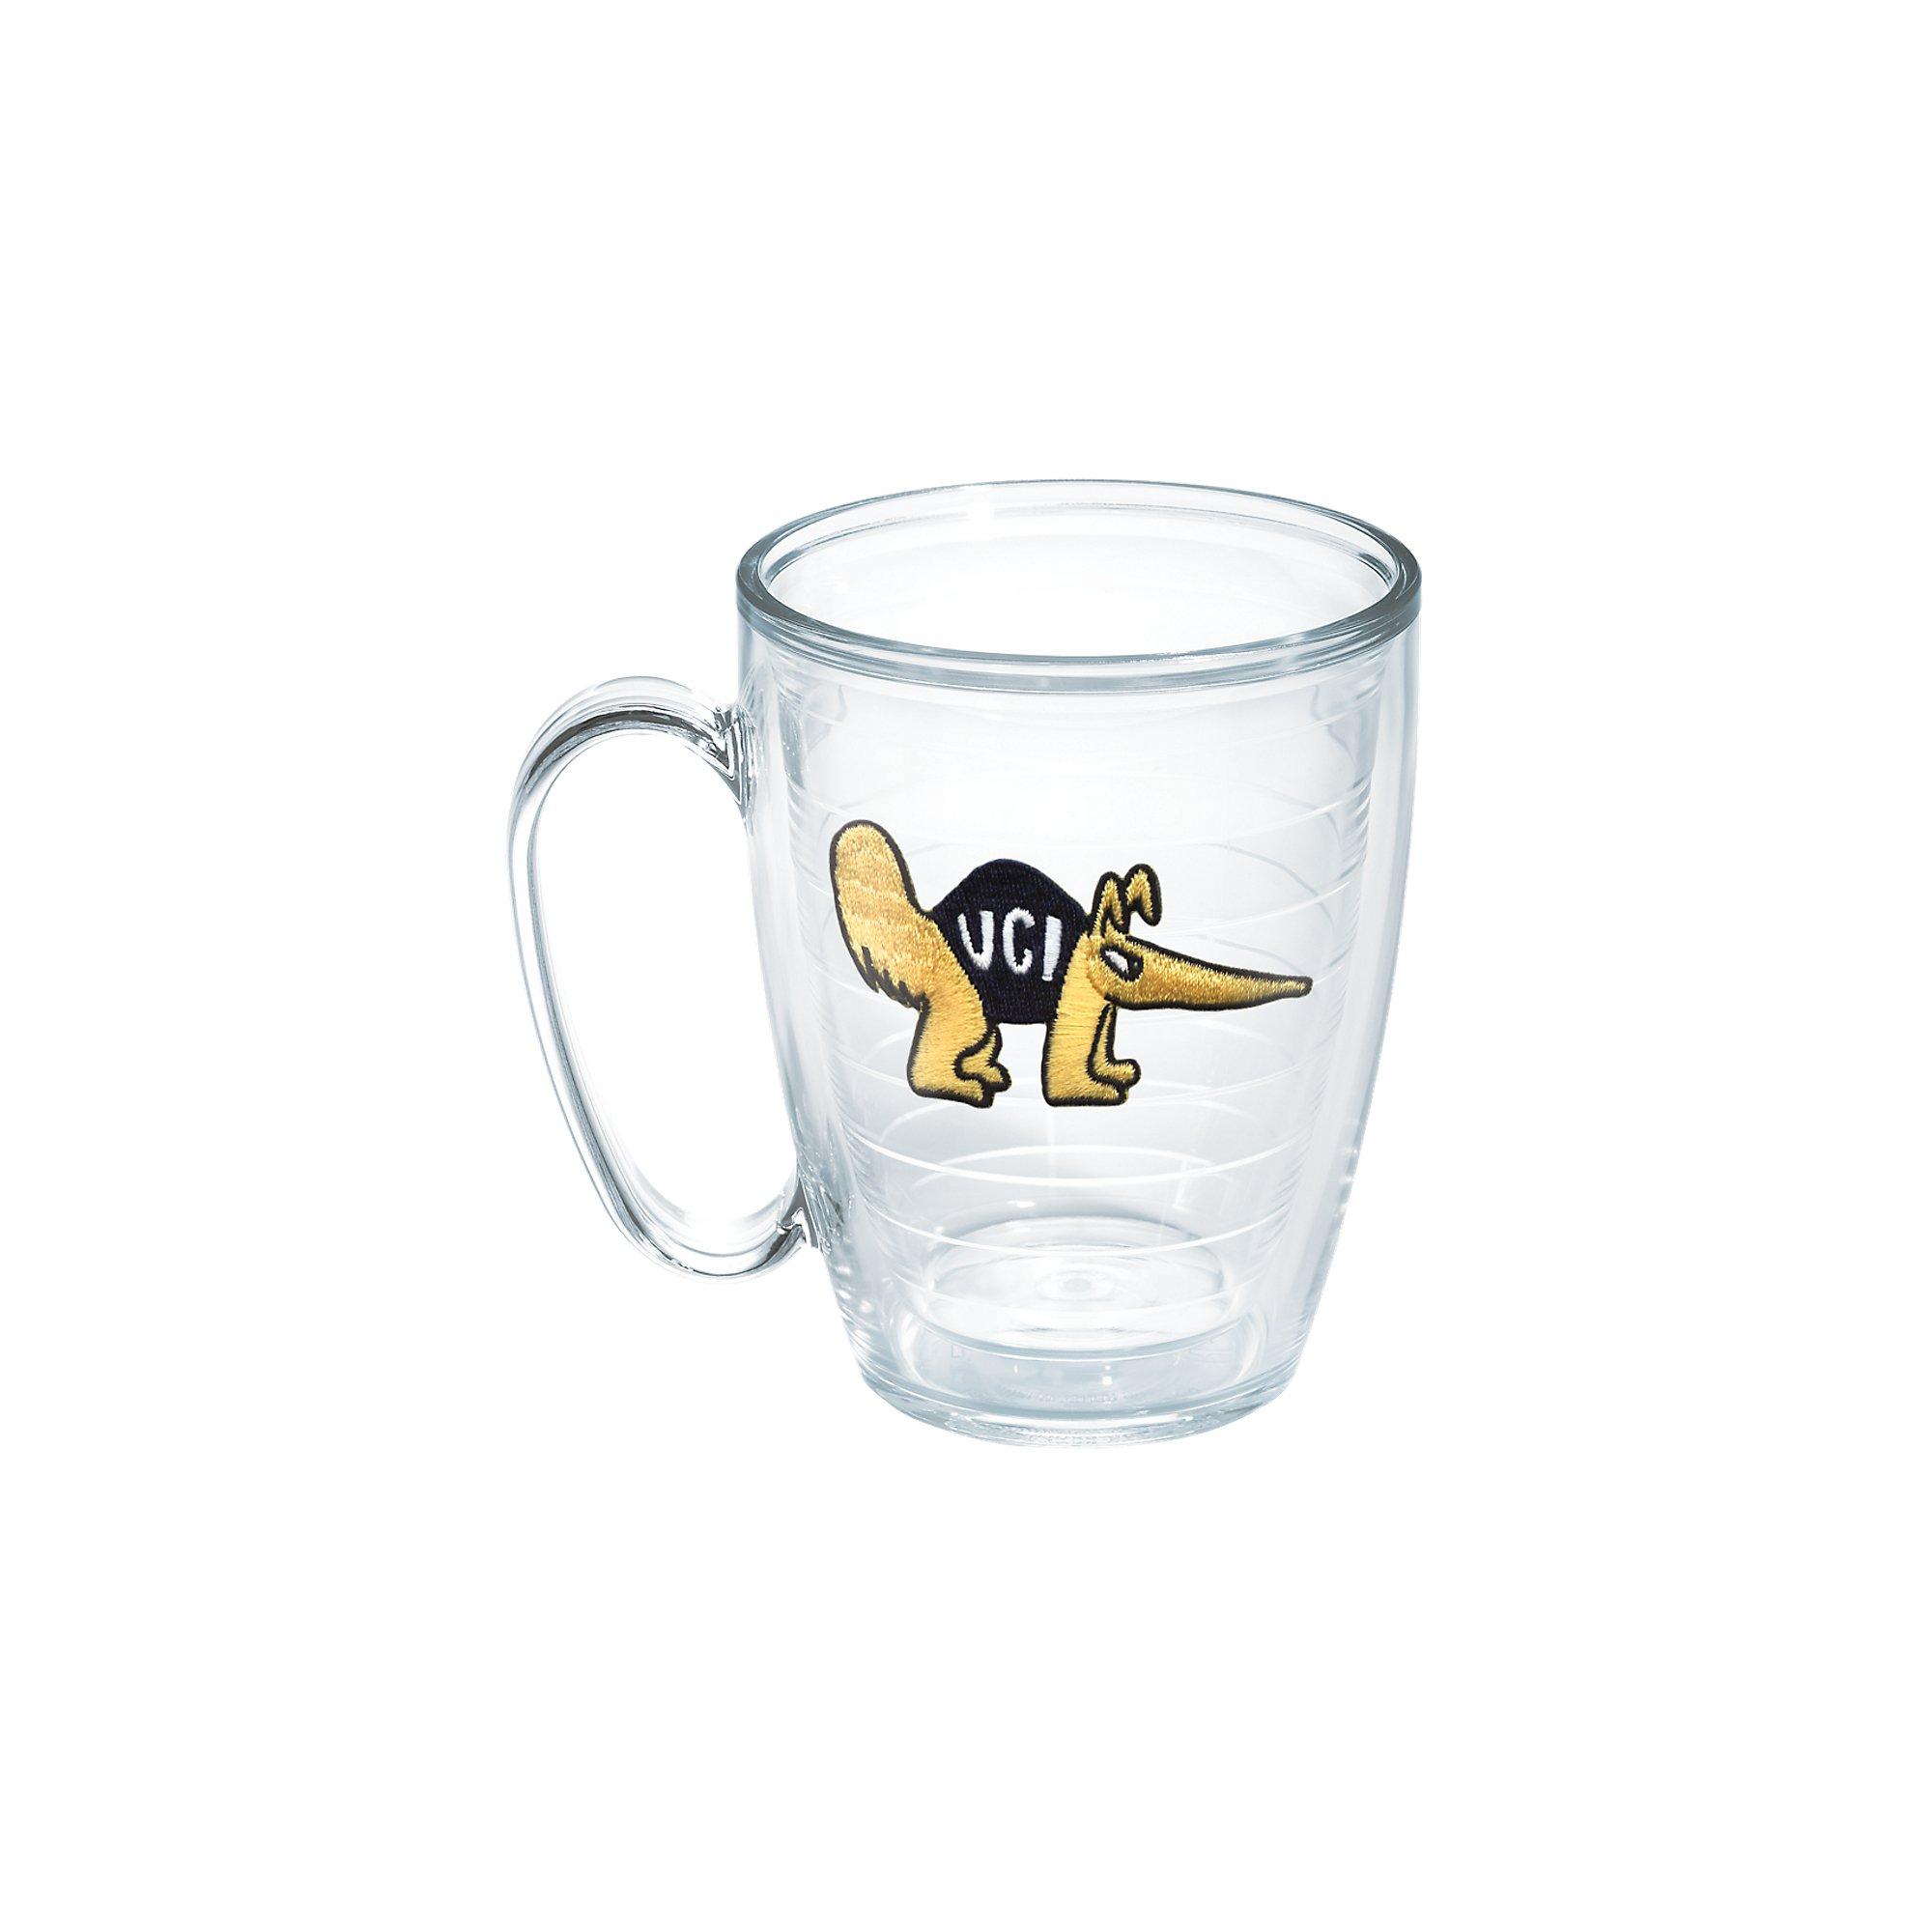 Tervis 1049654 Ca University Irvine Emblem Individual Mug, 16 oz, Clear